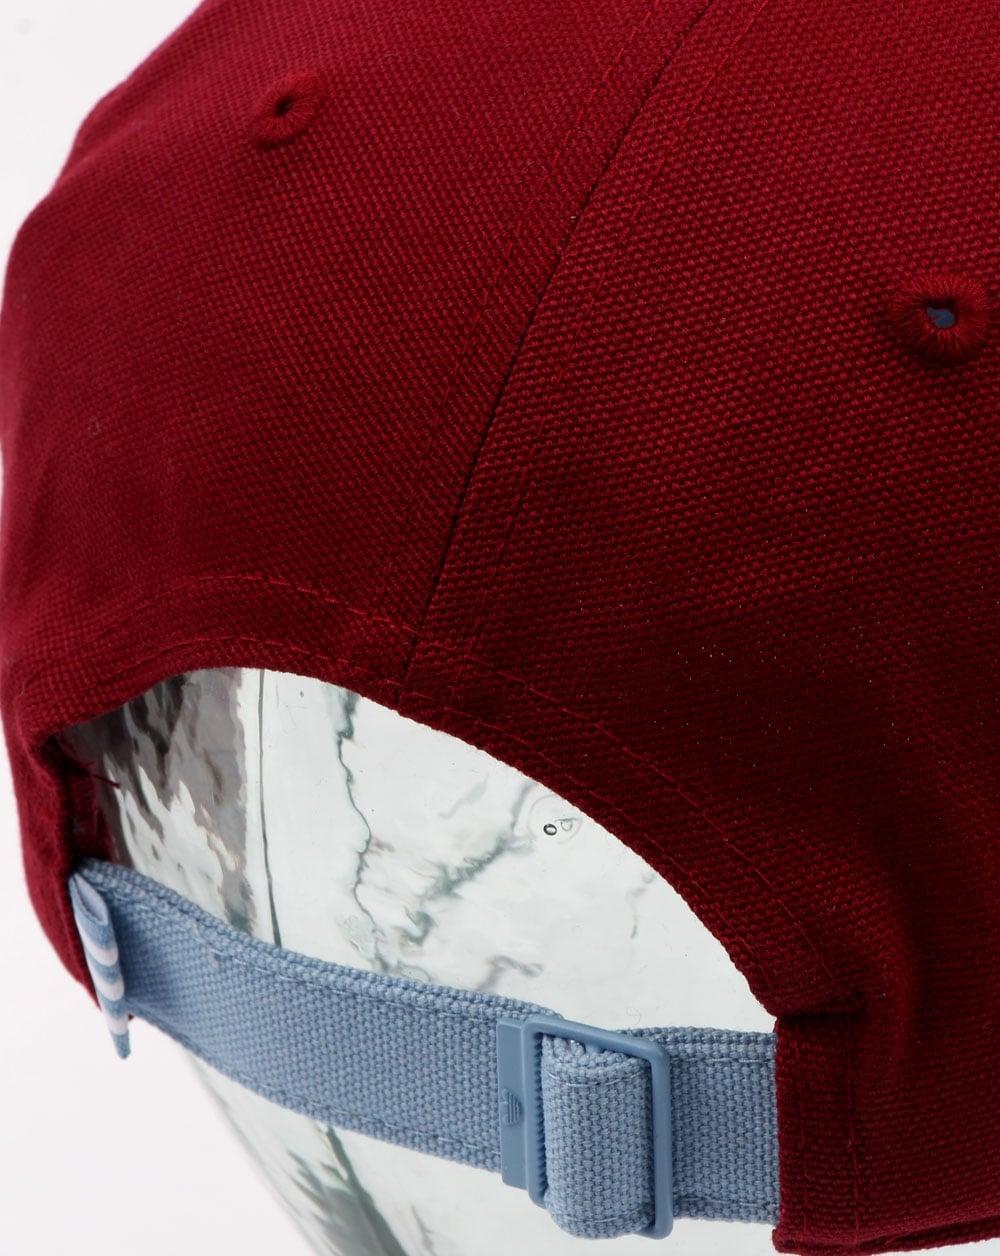 6d979cf8768 Adidas Originals 6 Panel Unstructured Cap Burgundy ash Blue